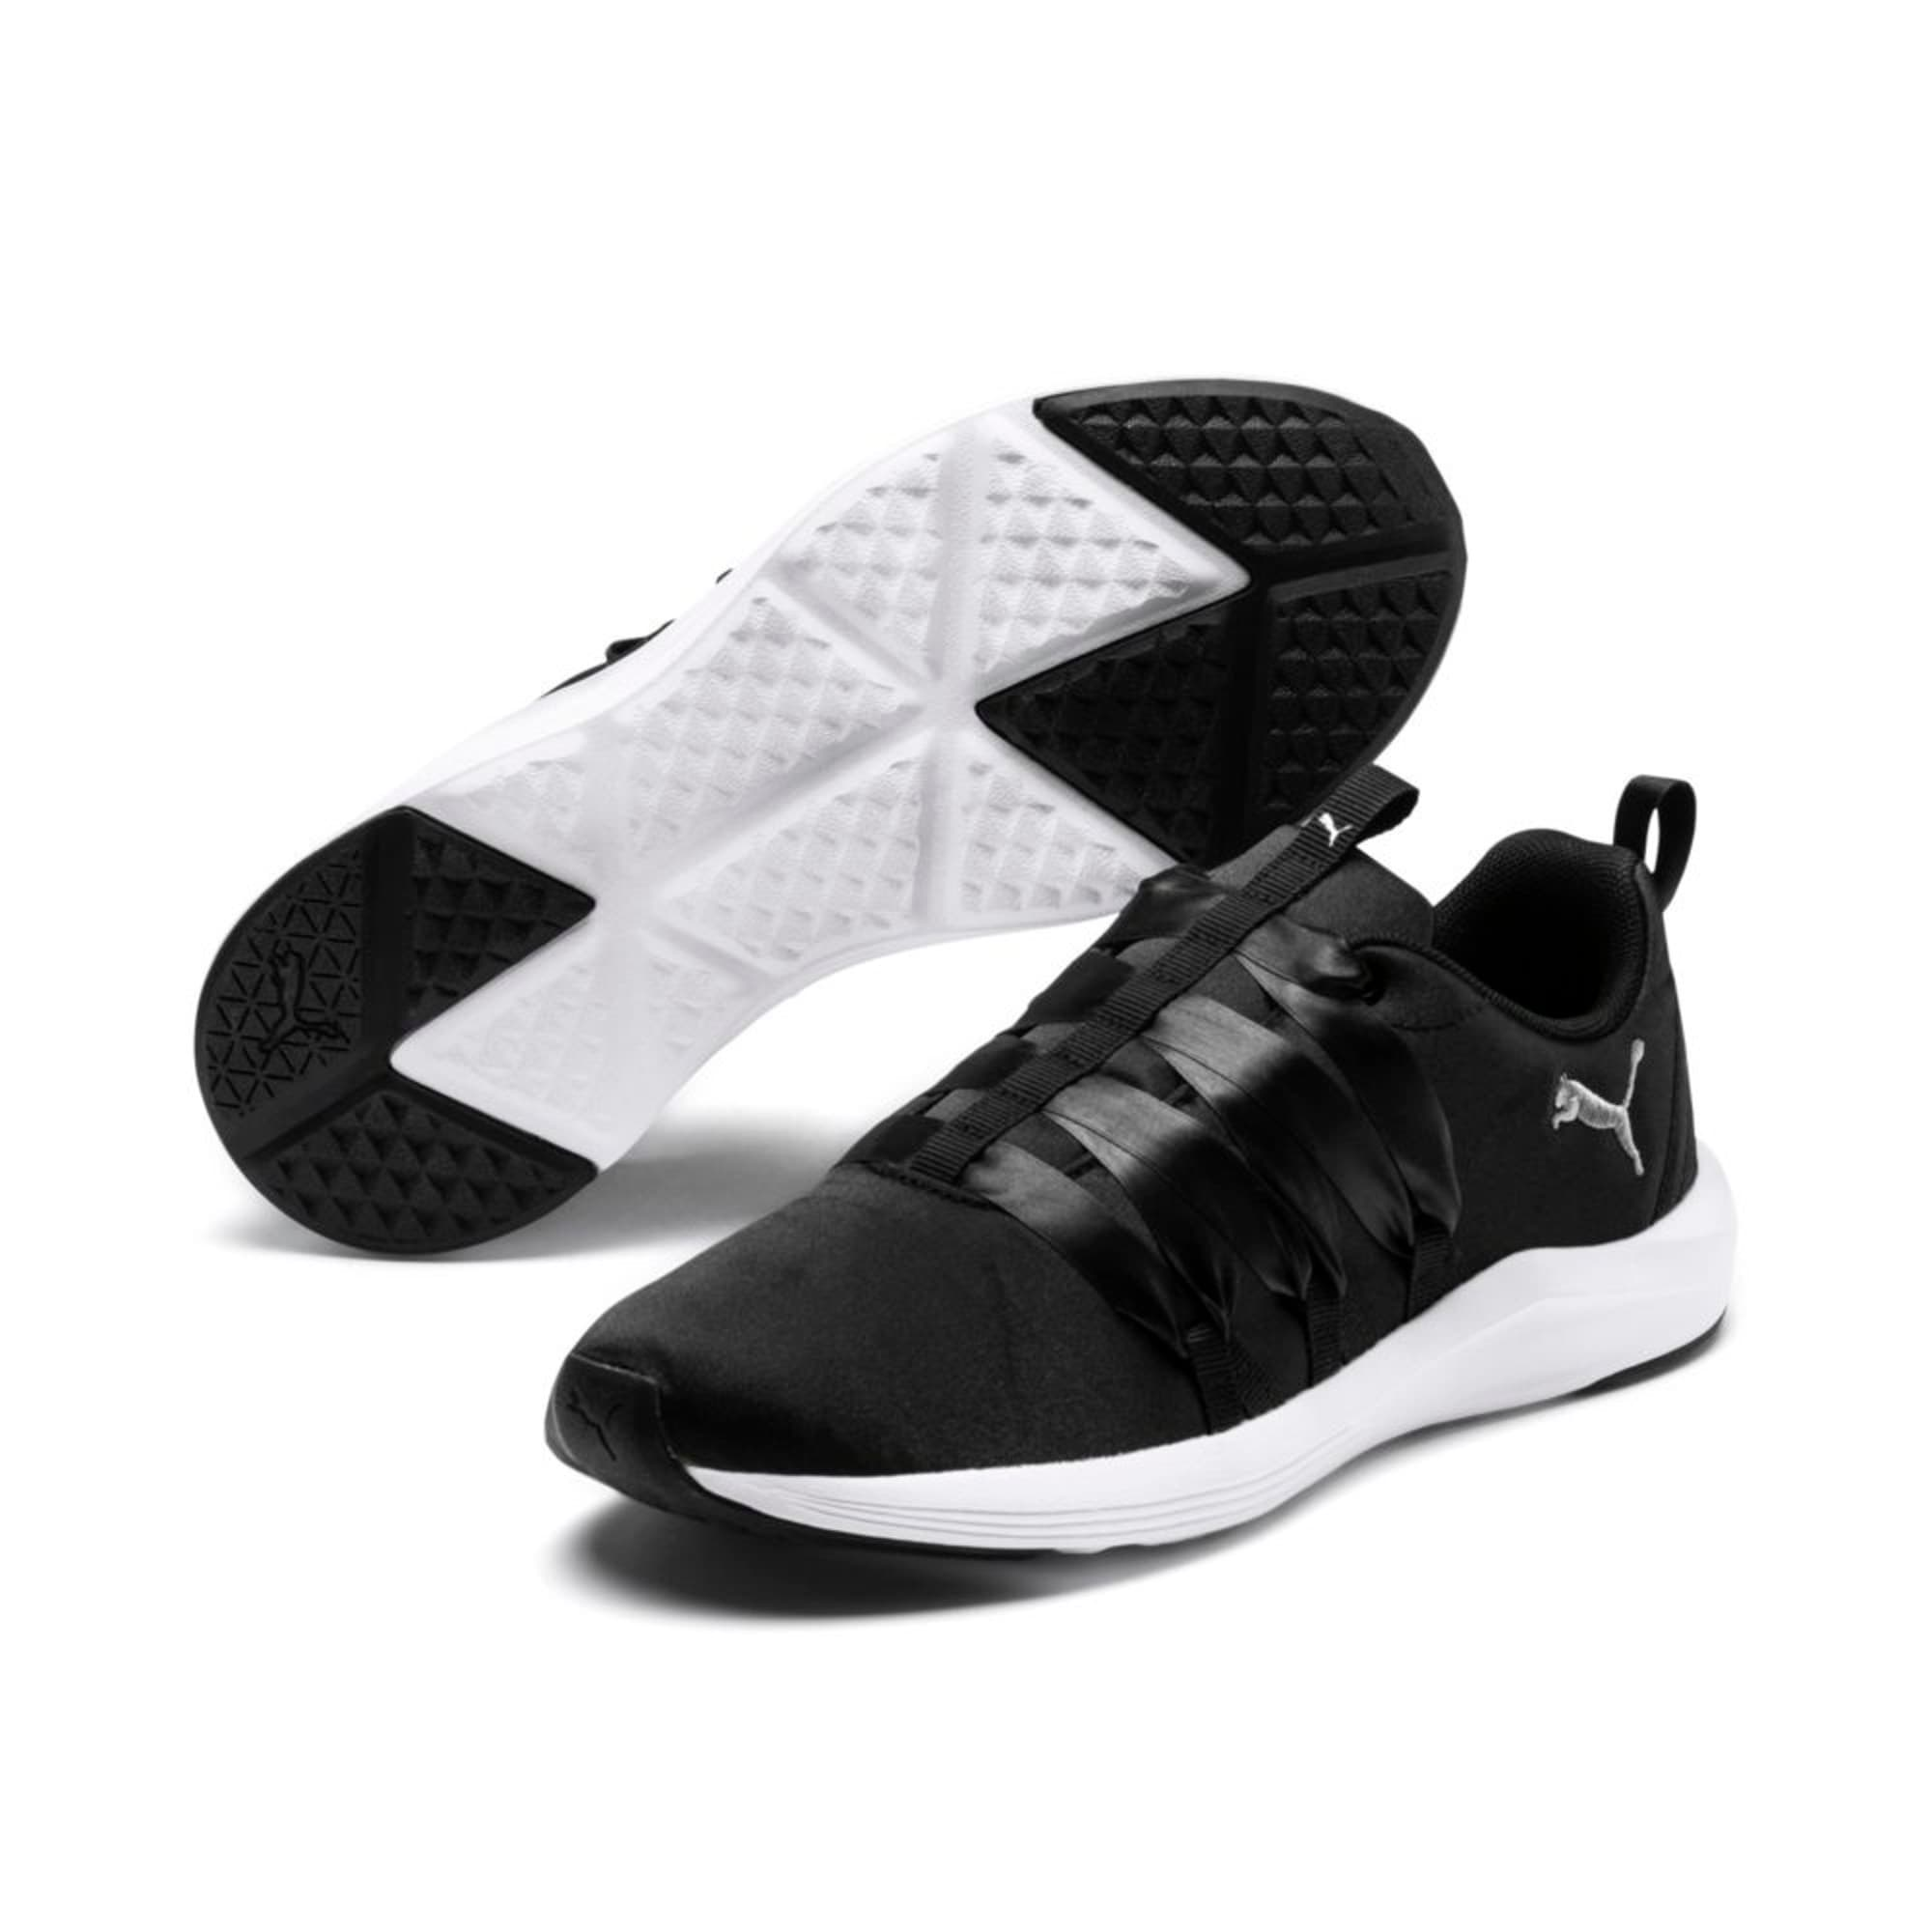 Thumbnail 6 of Prowl Alt Satin Women's Training Shoes, Puma Black-Puma White, medium-IND